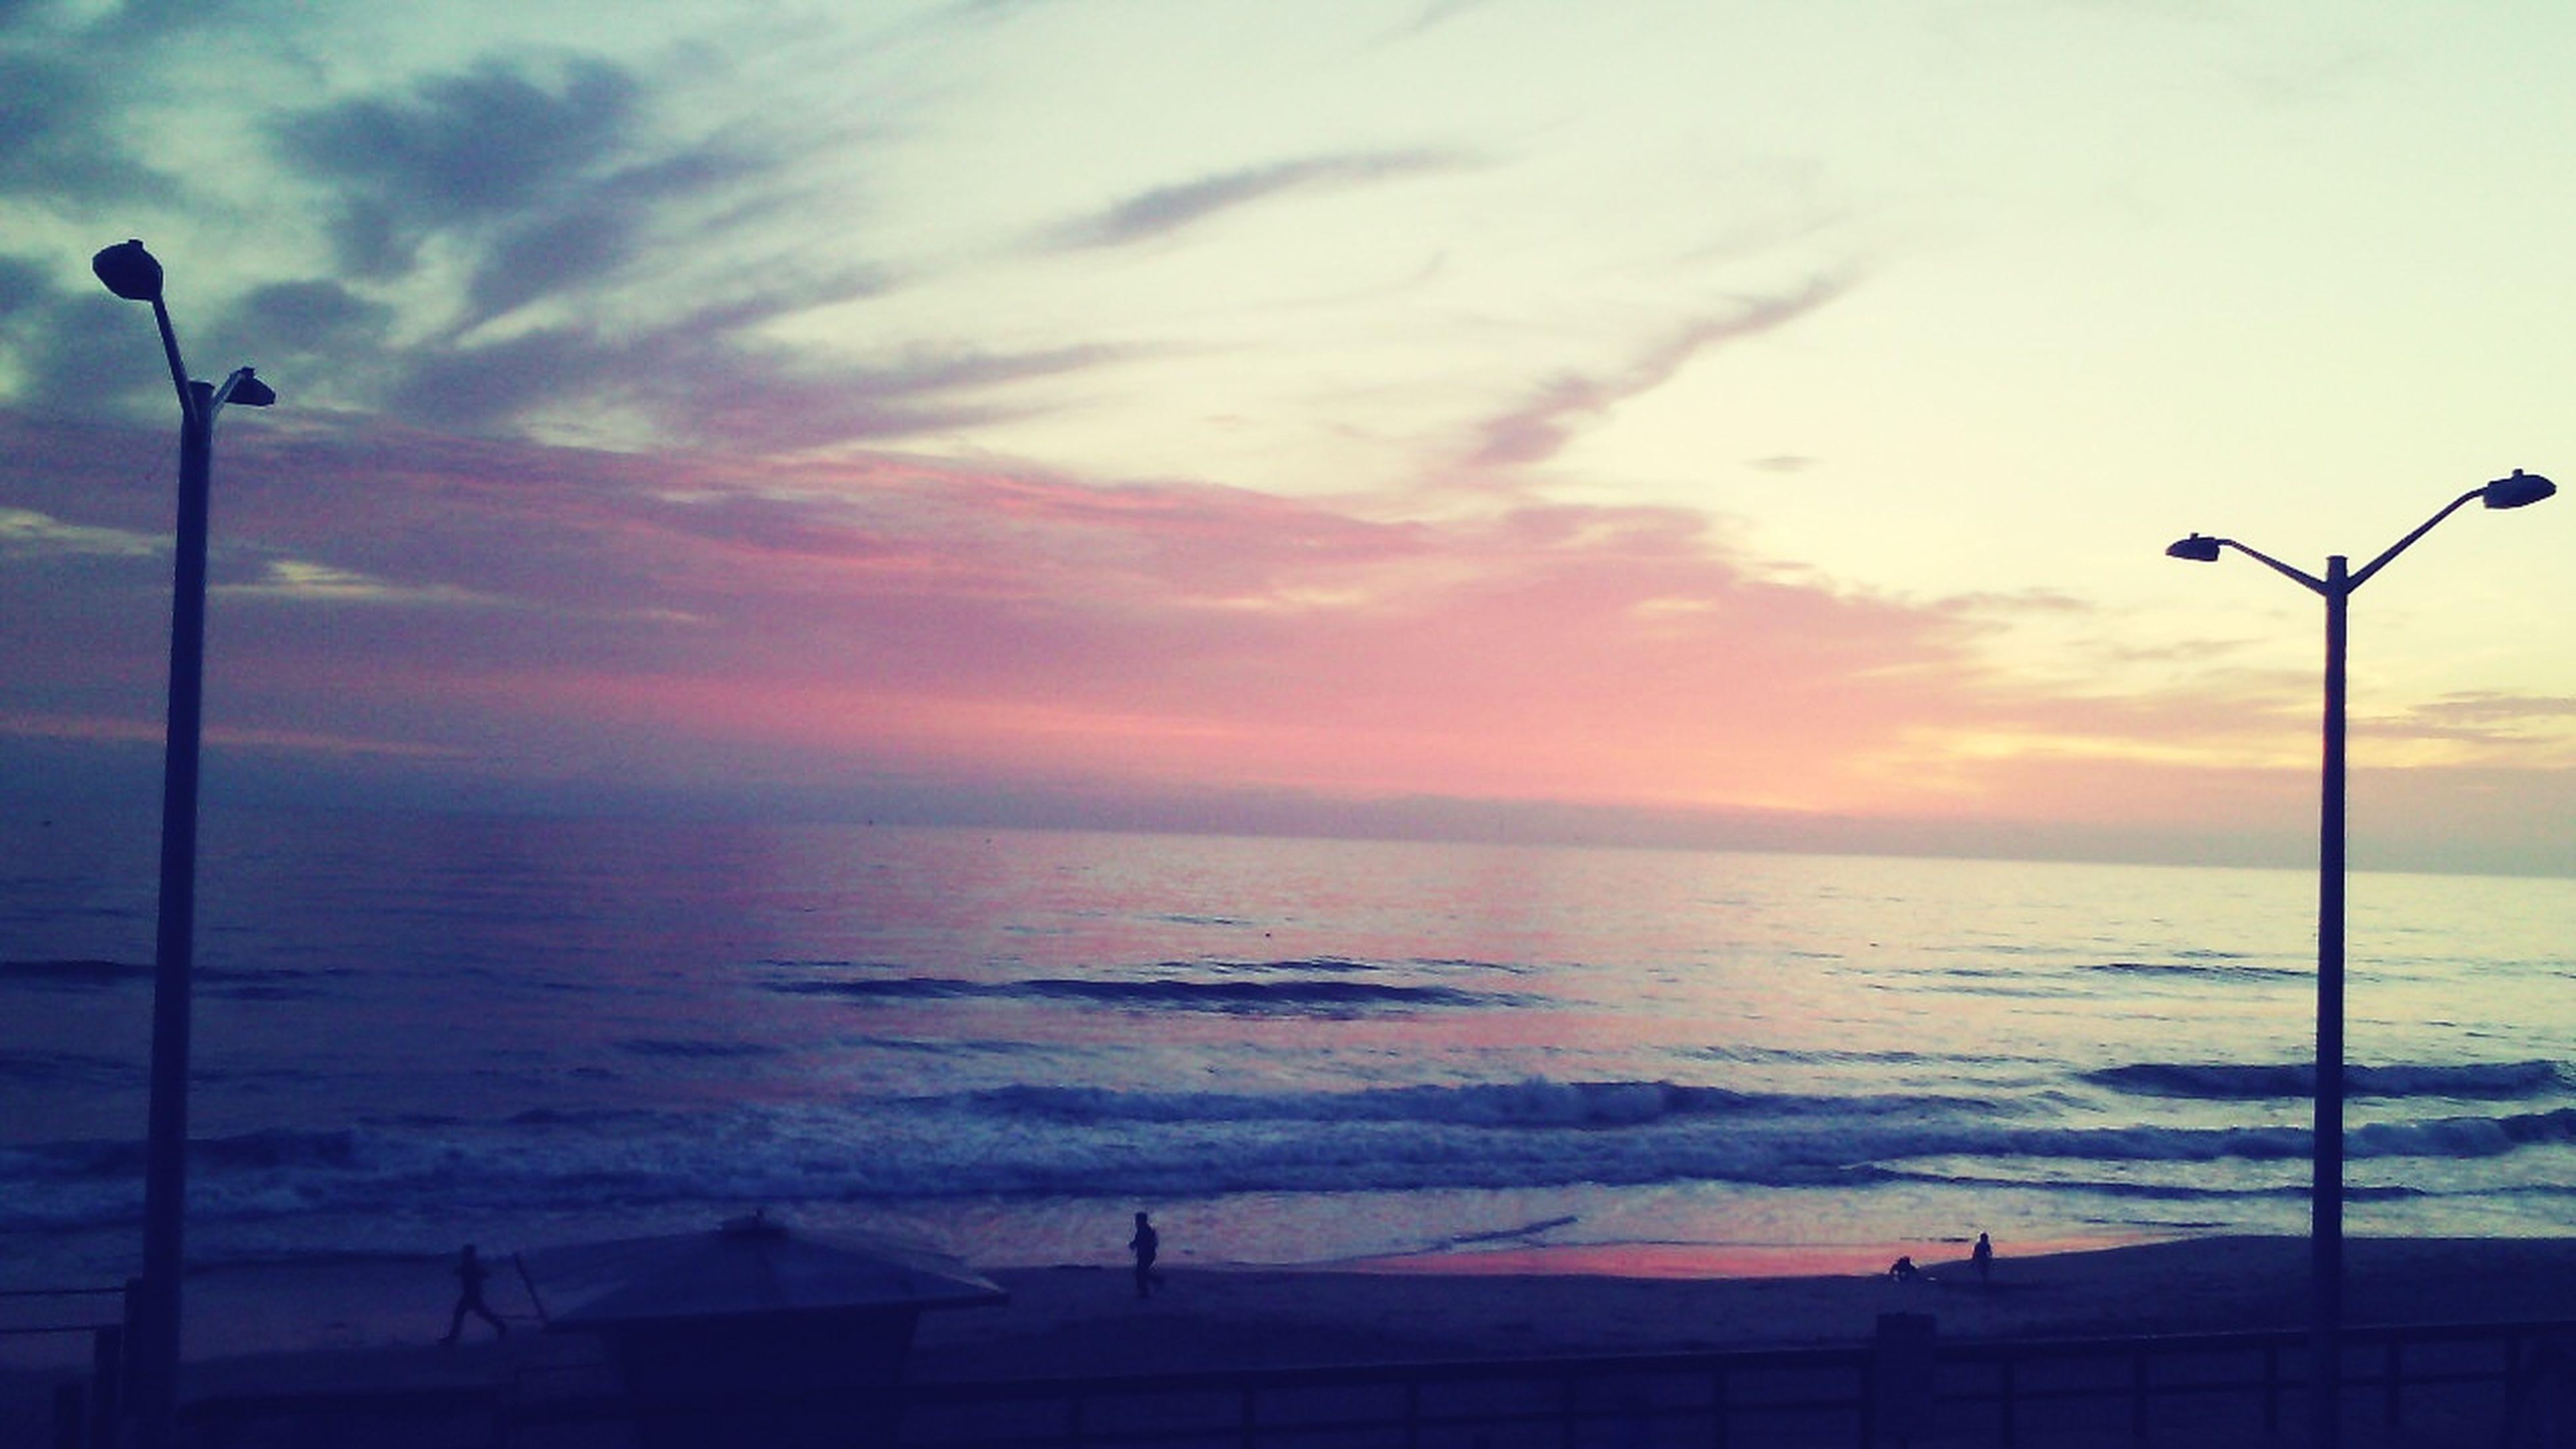 sea, horizon over water, sunset, sky, water, street light, scenics, beauty in nature, tranquility, tranquil scene, silhouette, lighting equipment, nature, idyllic, orange color, beach, cloud - sky, shore, outdoors, dusk